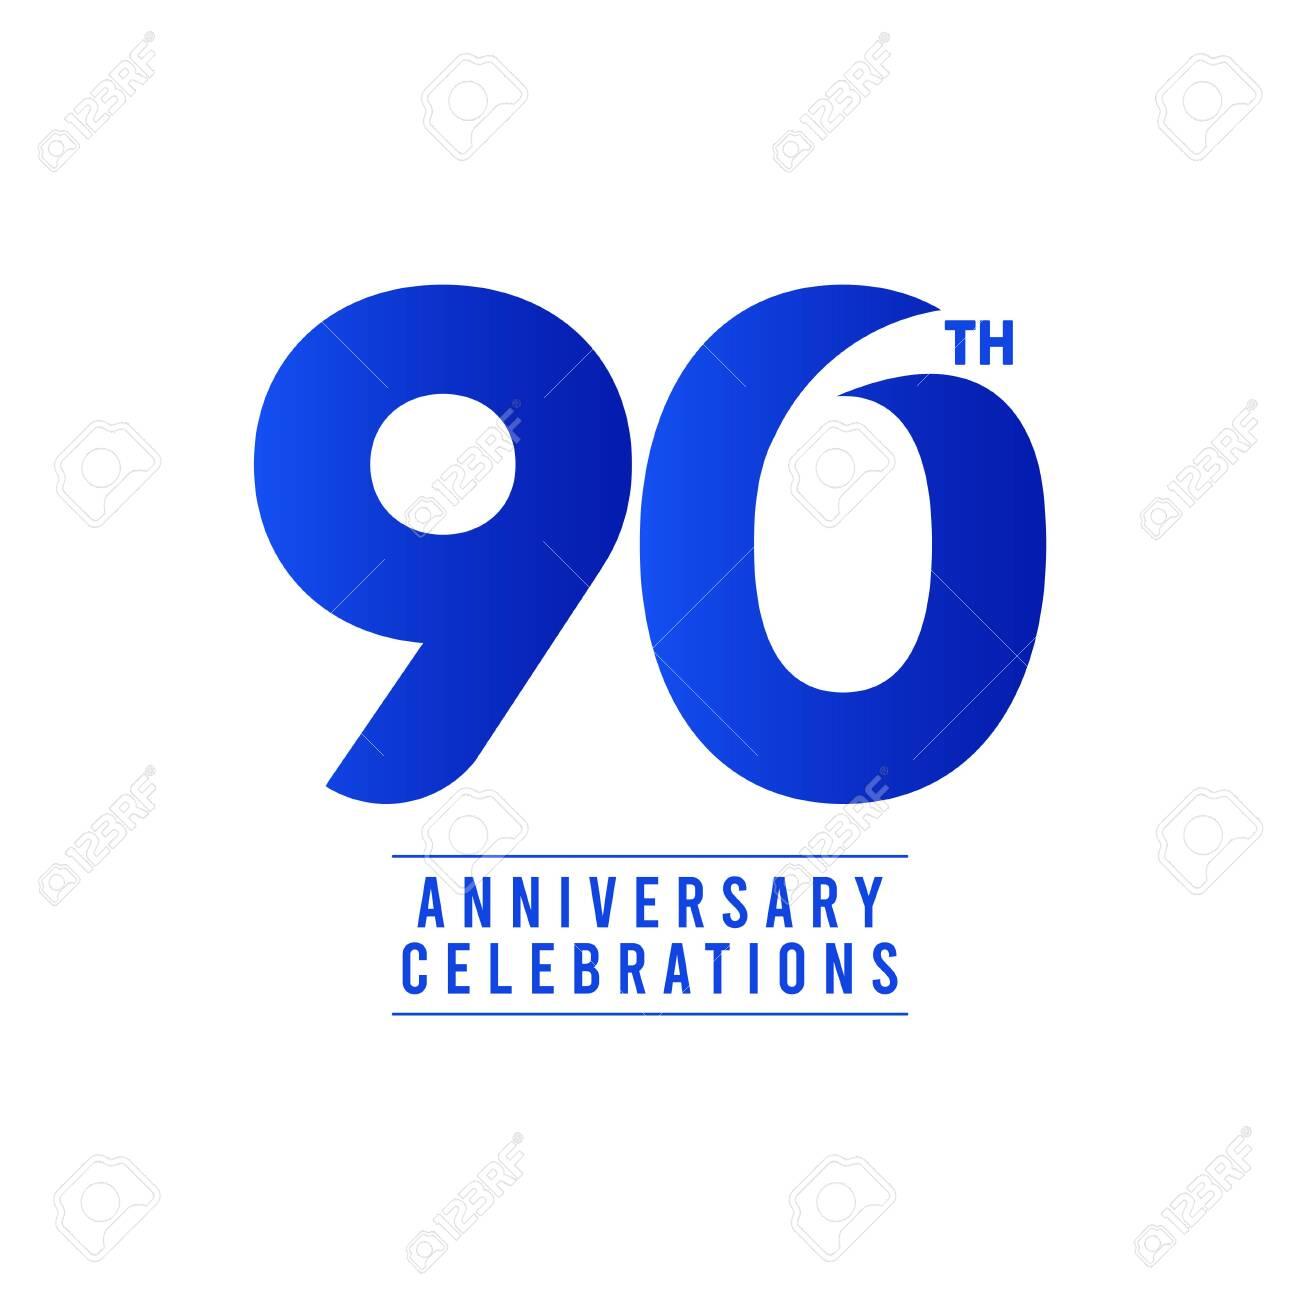 90 Th Anniversary Celebrations Vector Template Design Illustration - 140343284